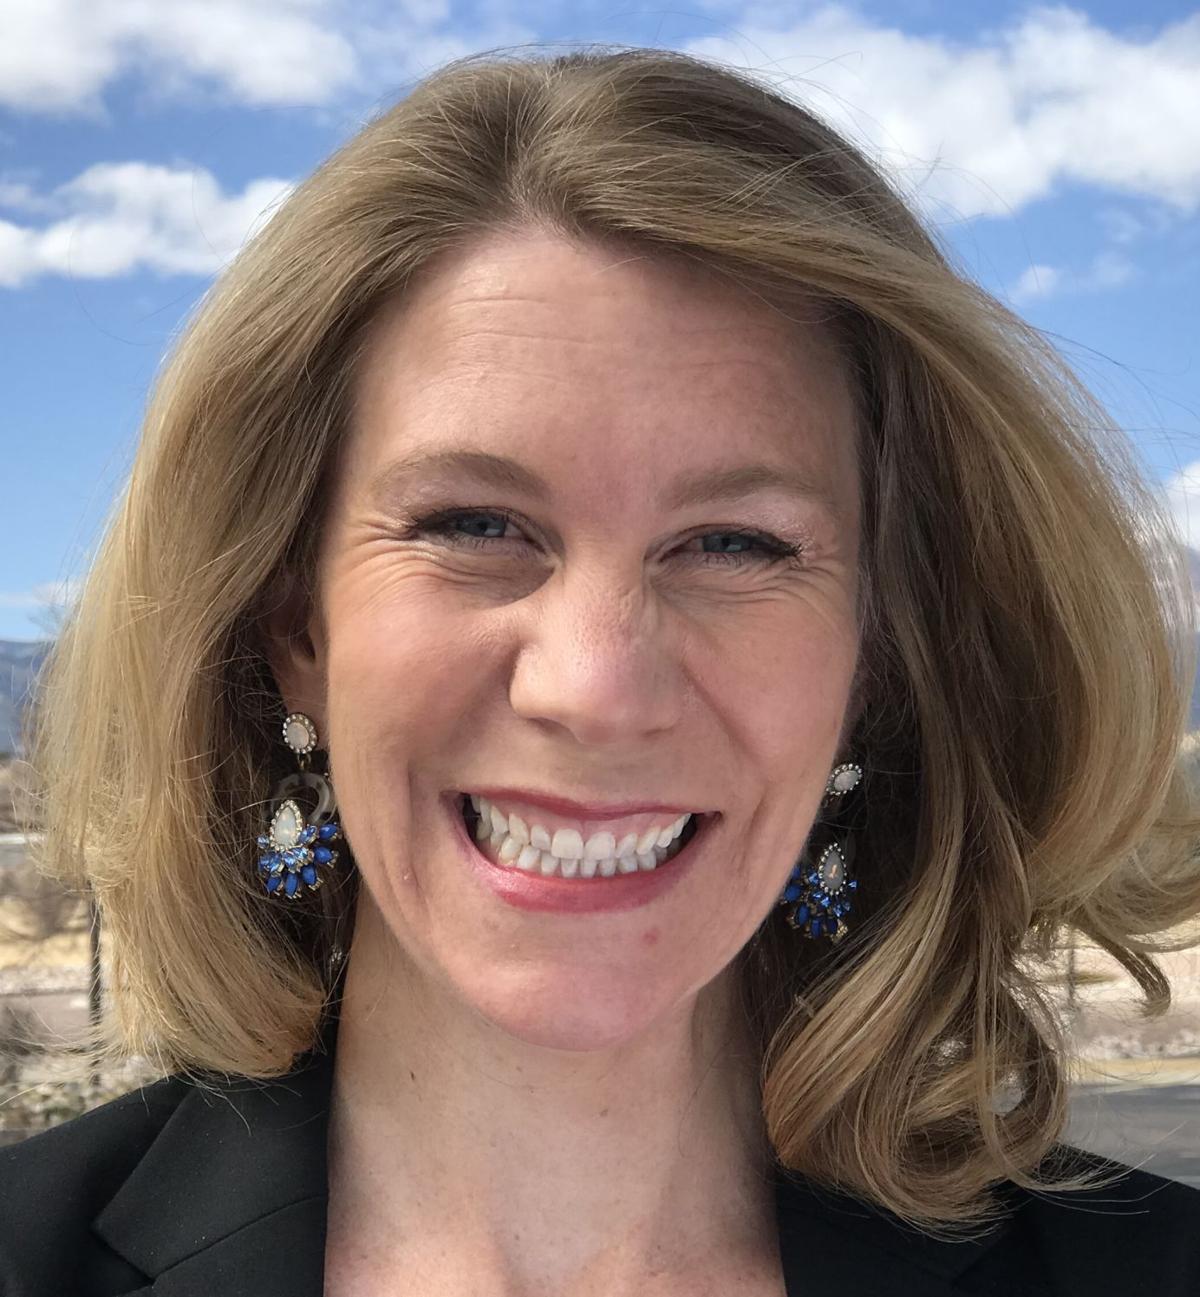 Colorado Springs Movers & Shakers: Kate Faricy Maiurro